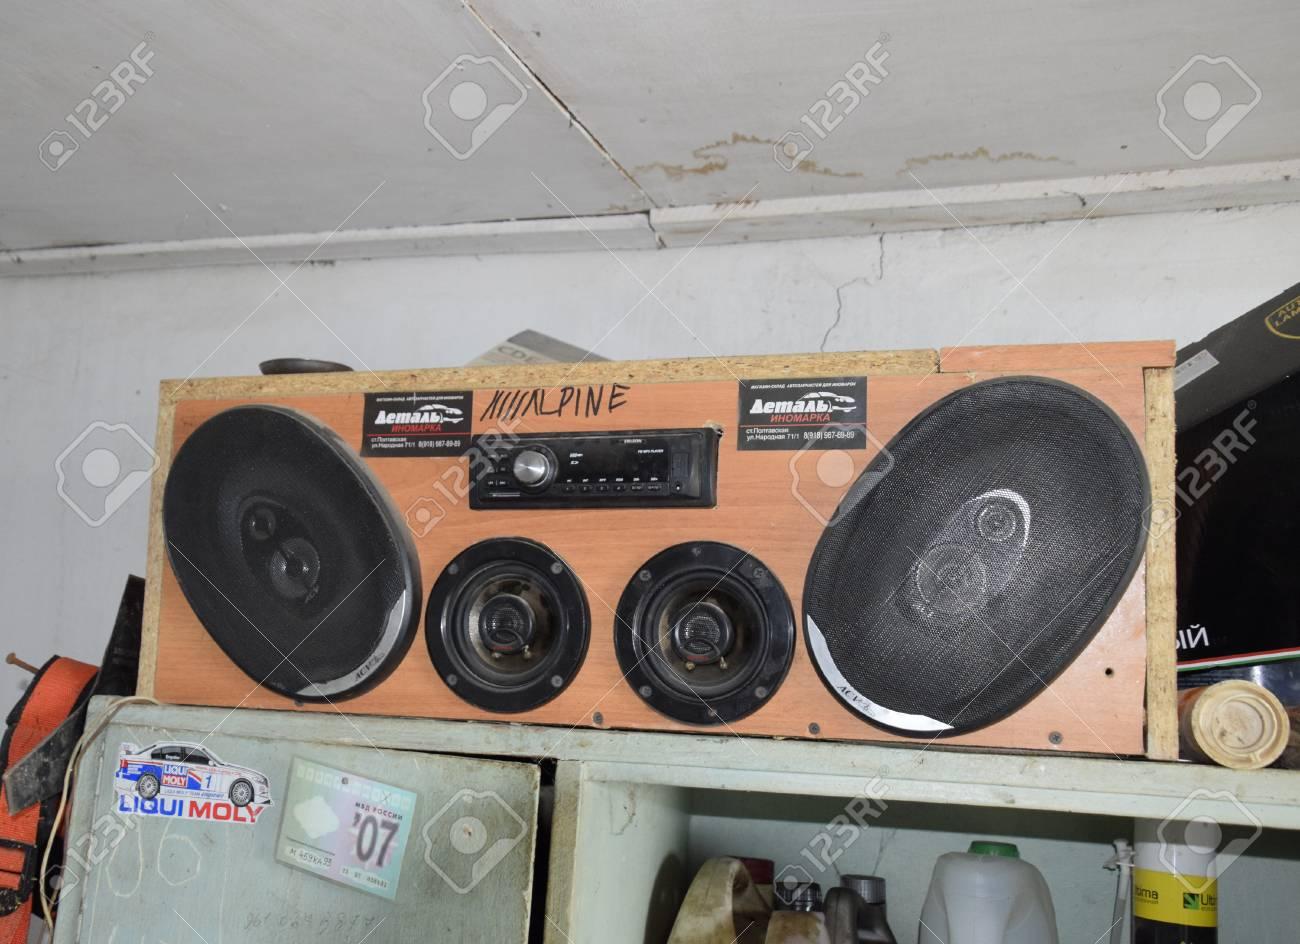 Krasnodar, Russia - July 28, 2017: Homemade speaker system from